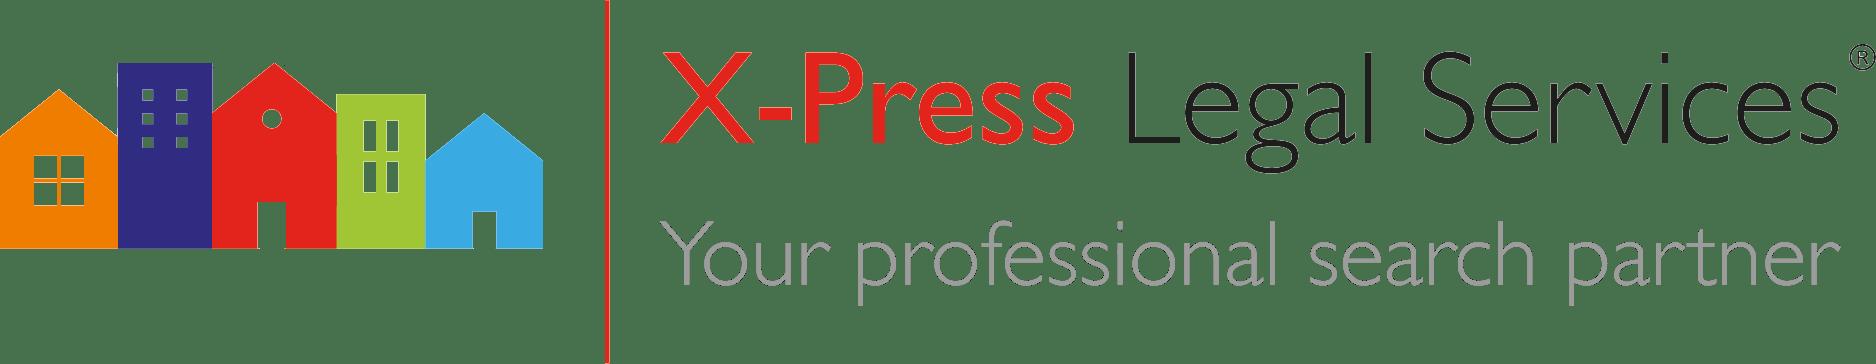 x-press-legal-services-logo-full-colour